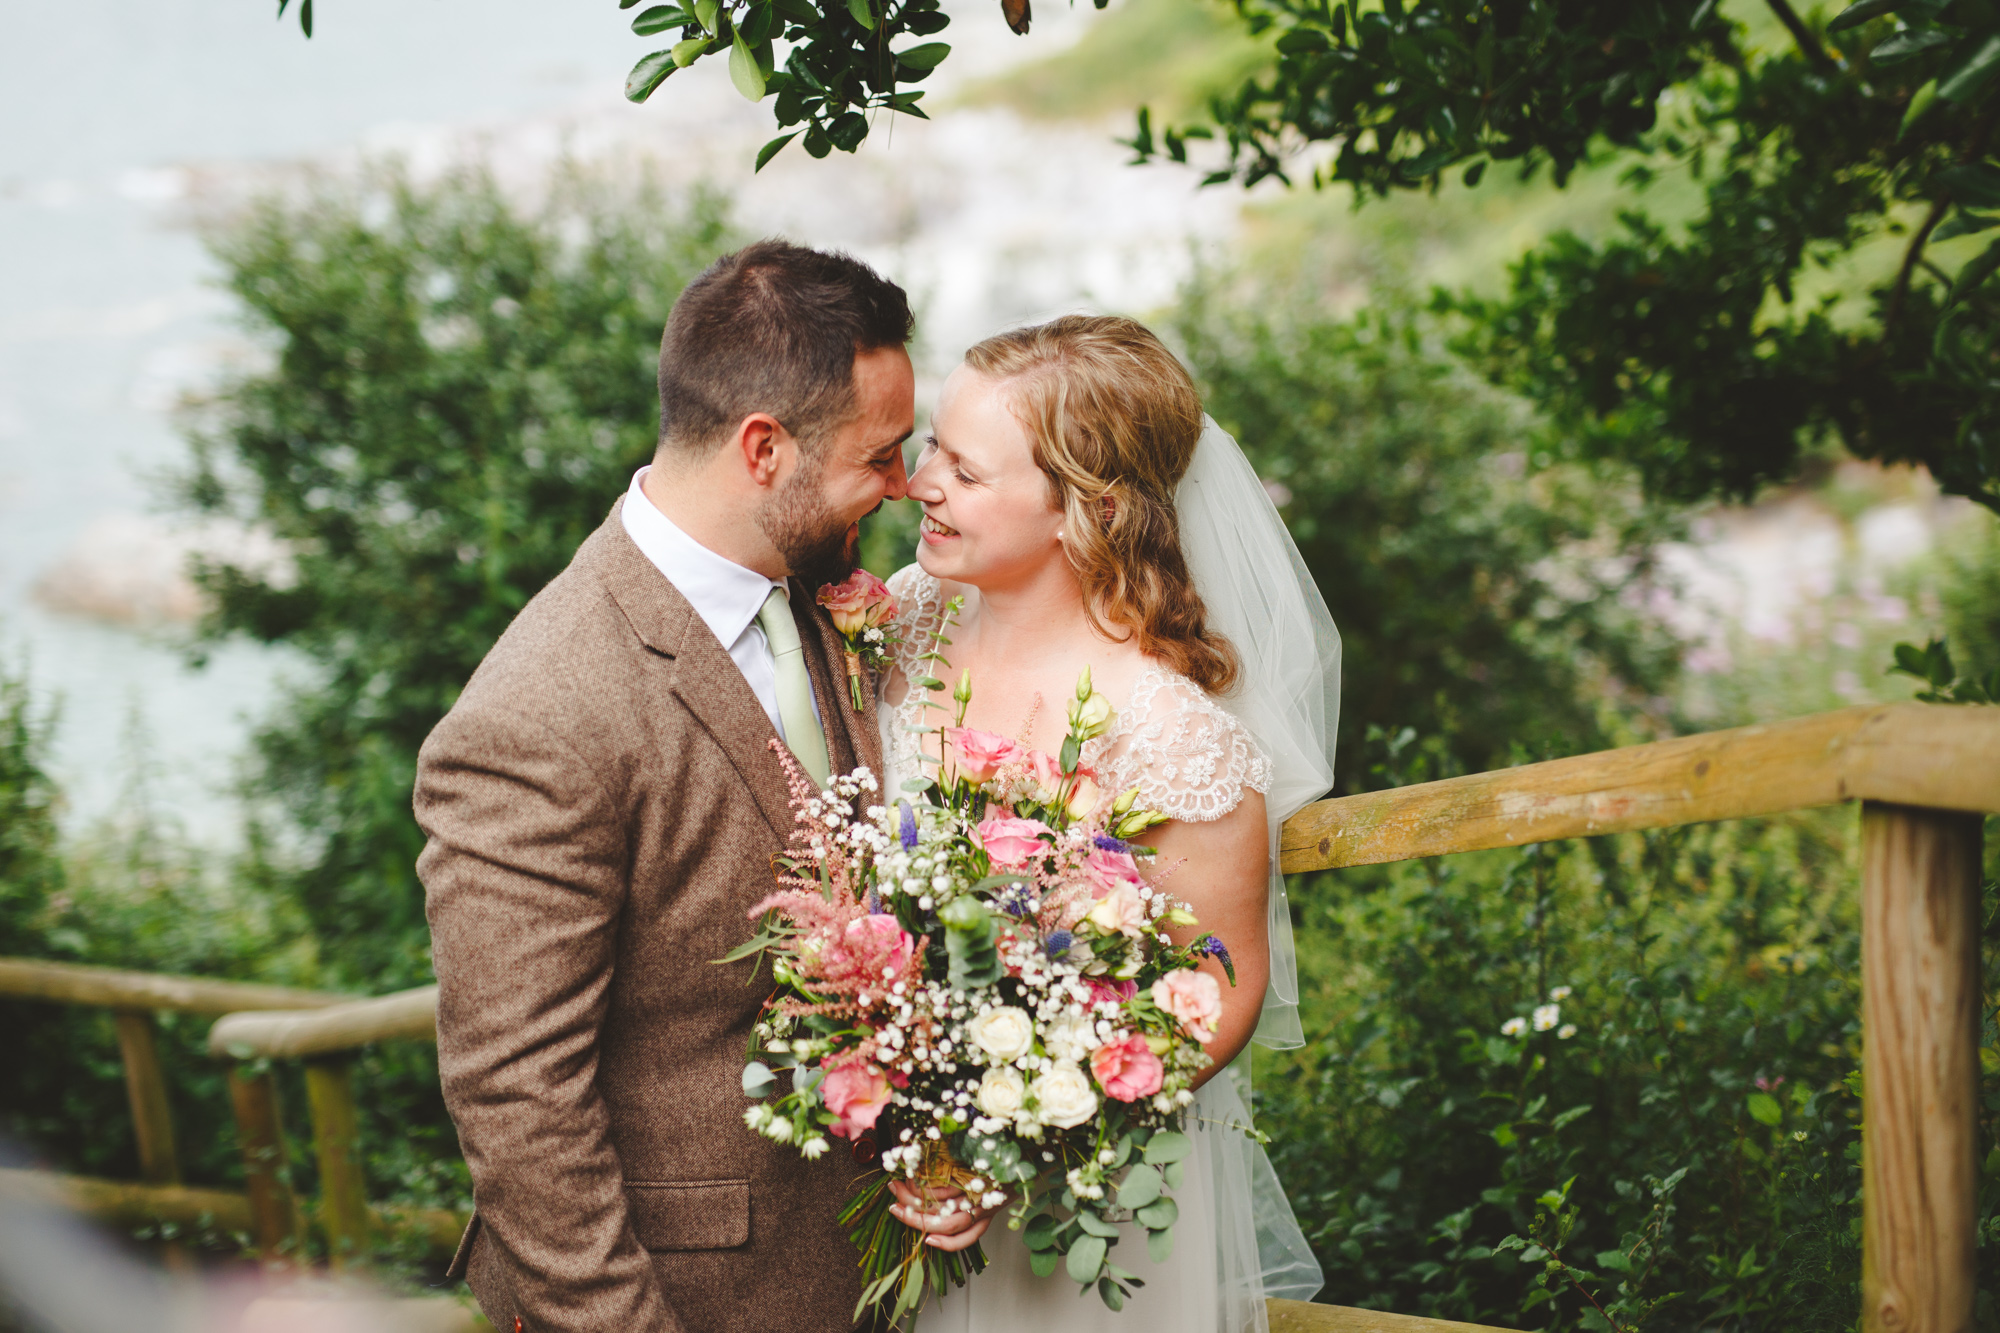 cornwall-alternative-wedding-photographer-beach-wedding-10.jpg